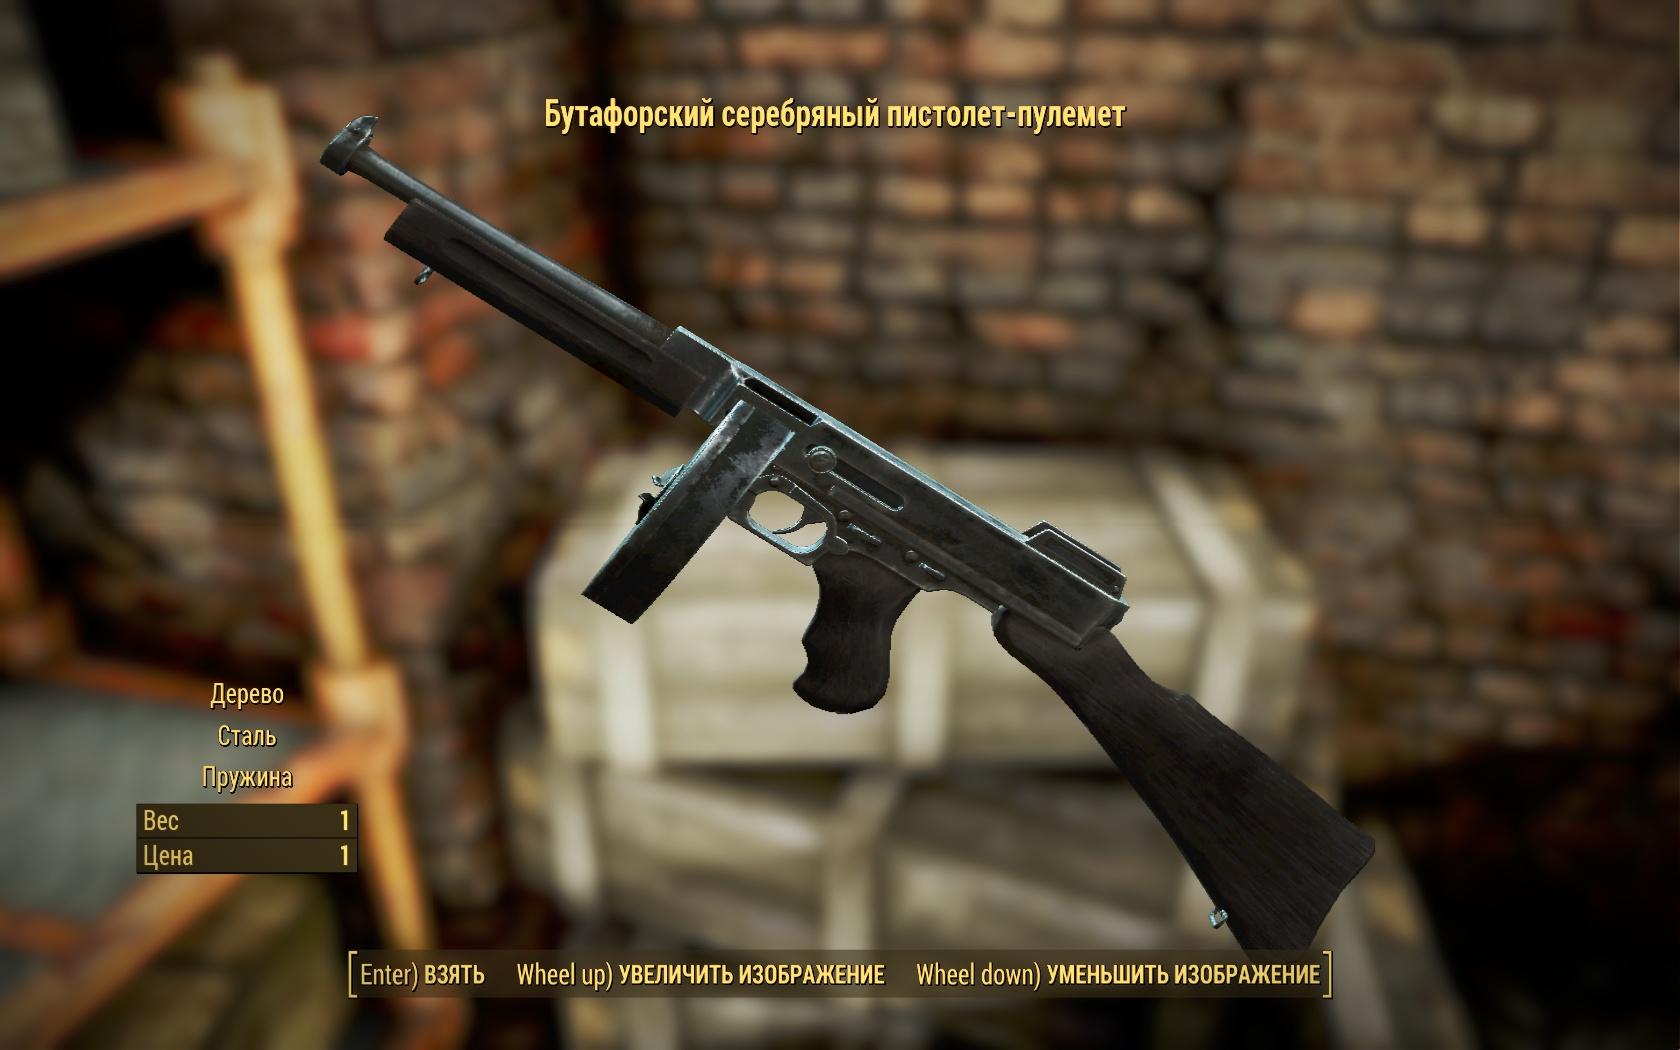 Бутафорский серебряный пистолет-пулемёт (Хьюбрис Комикс) - Fallout 4 Бутафорский, Комикс, Оружие, пистолет-пулемёт, серебряный, Хьюбрис, Хьюбрис Комикс